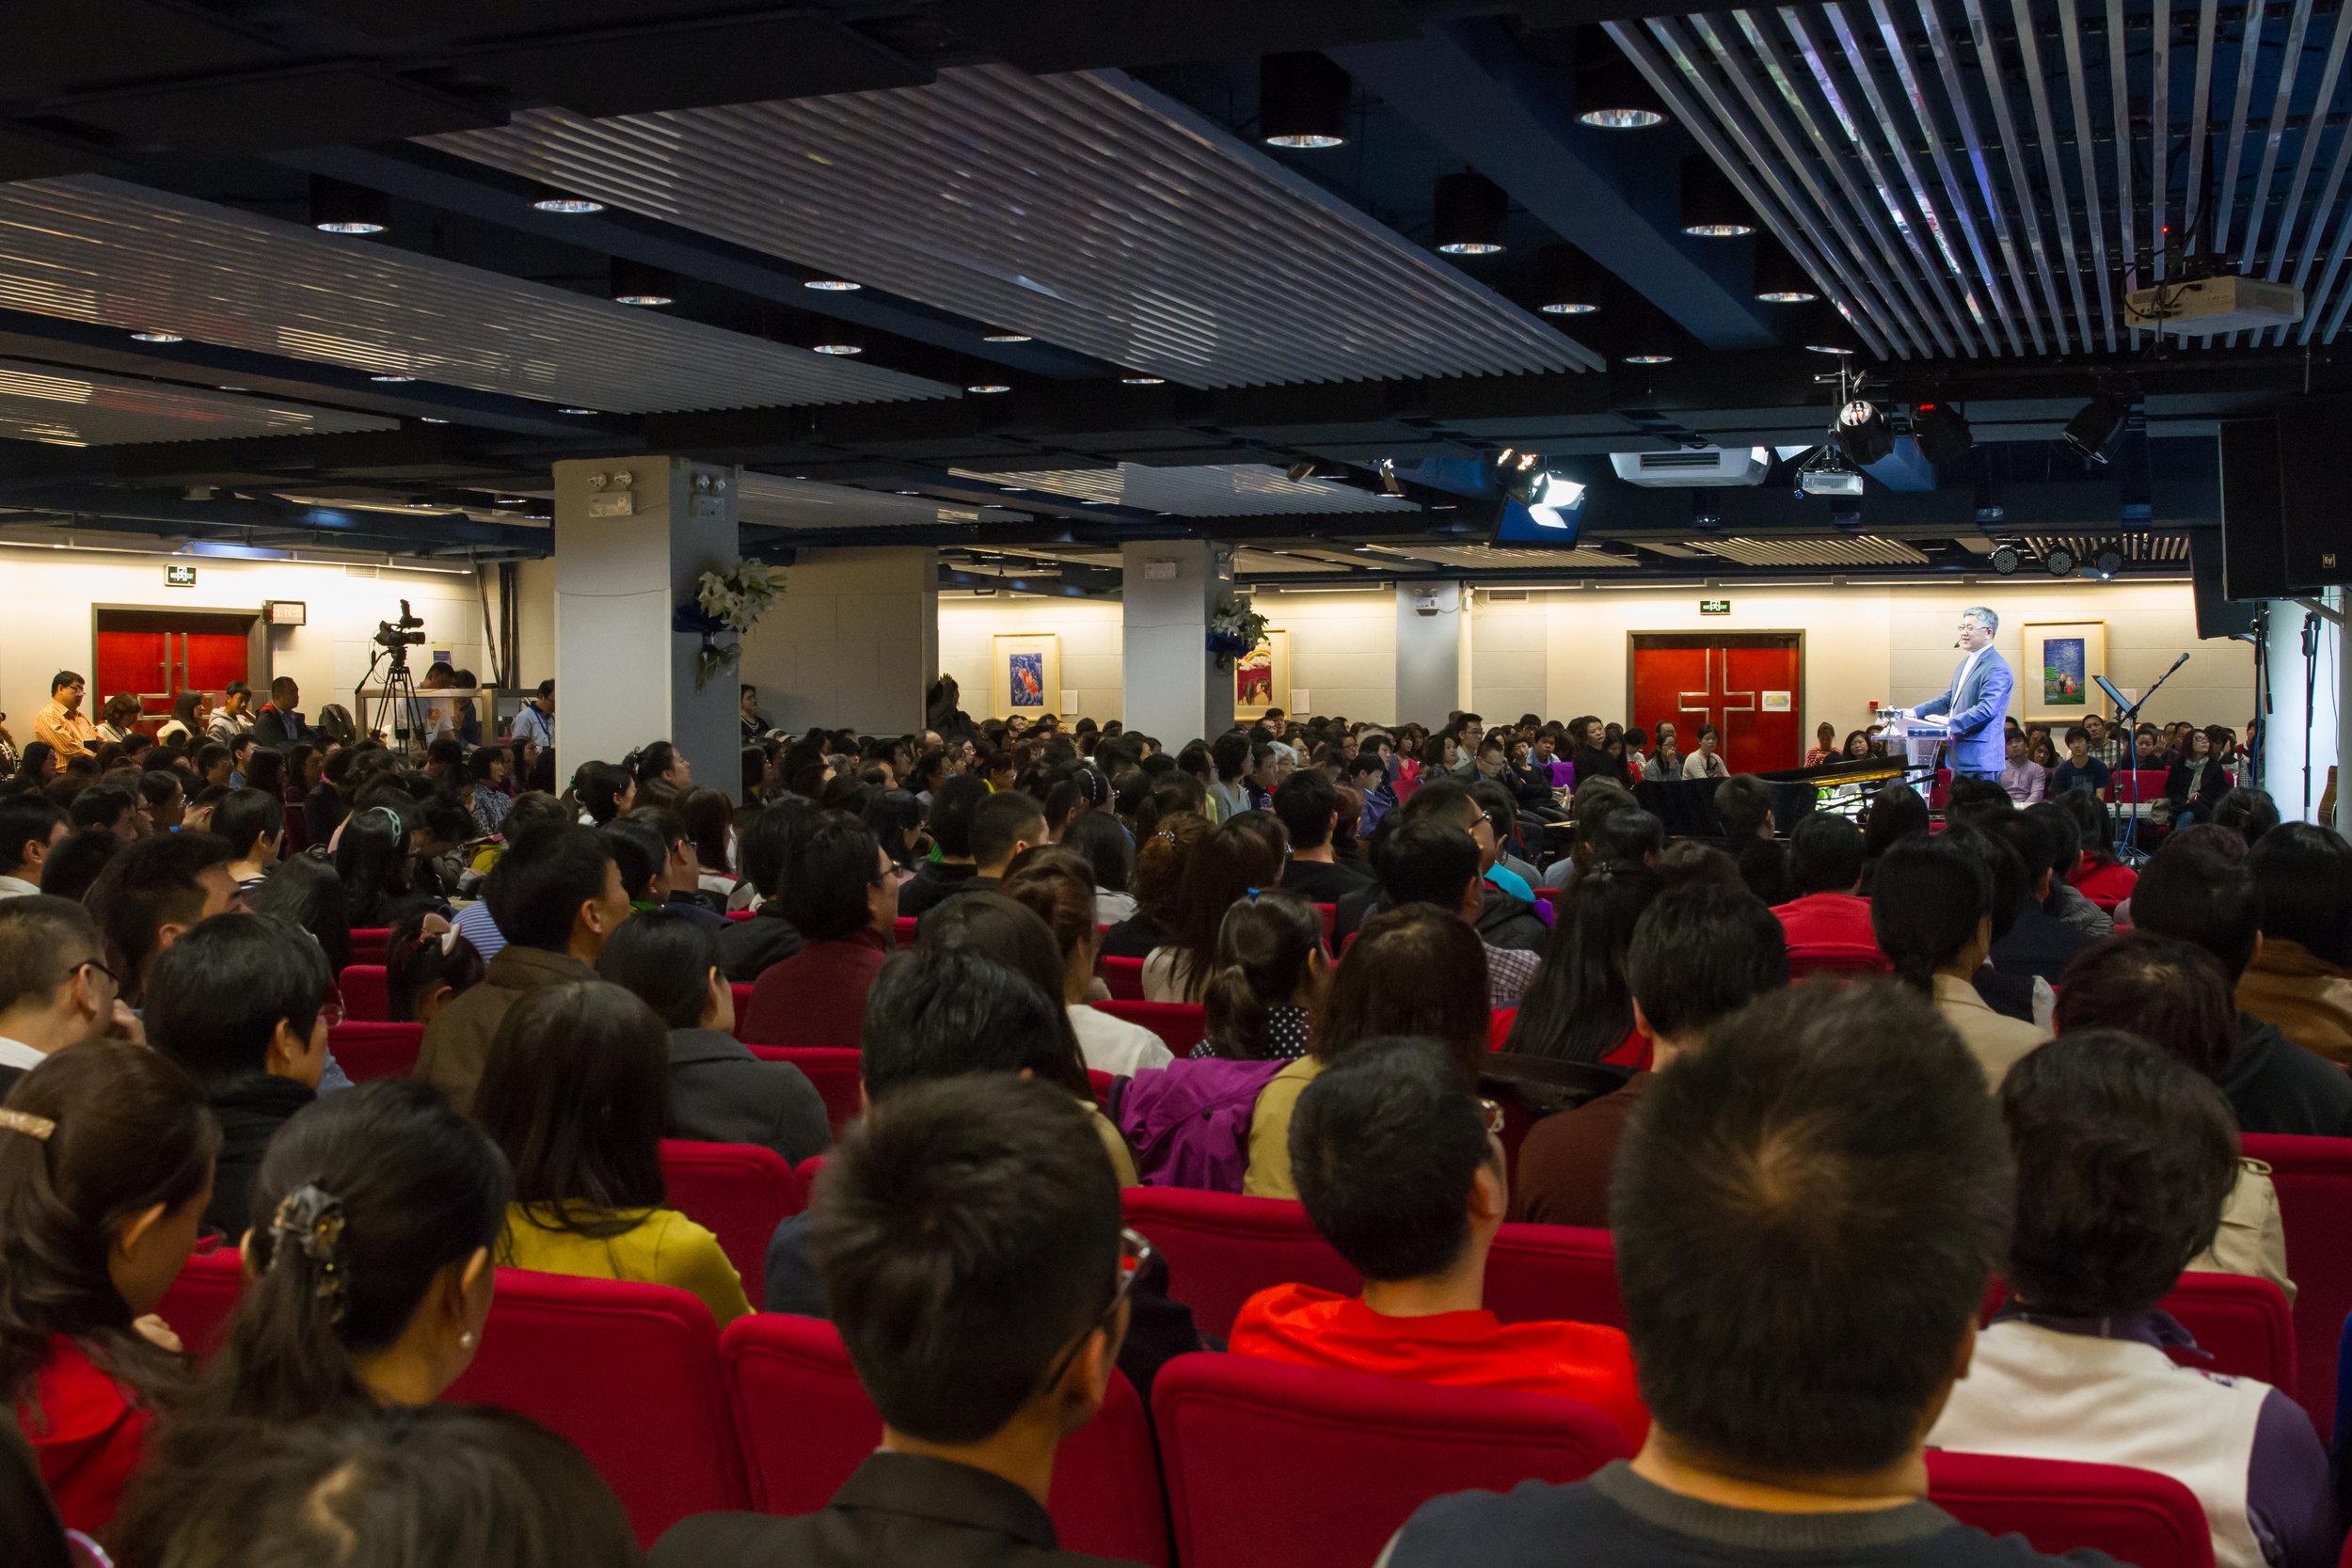 Sunday services, Zion Church Beijing